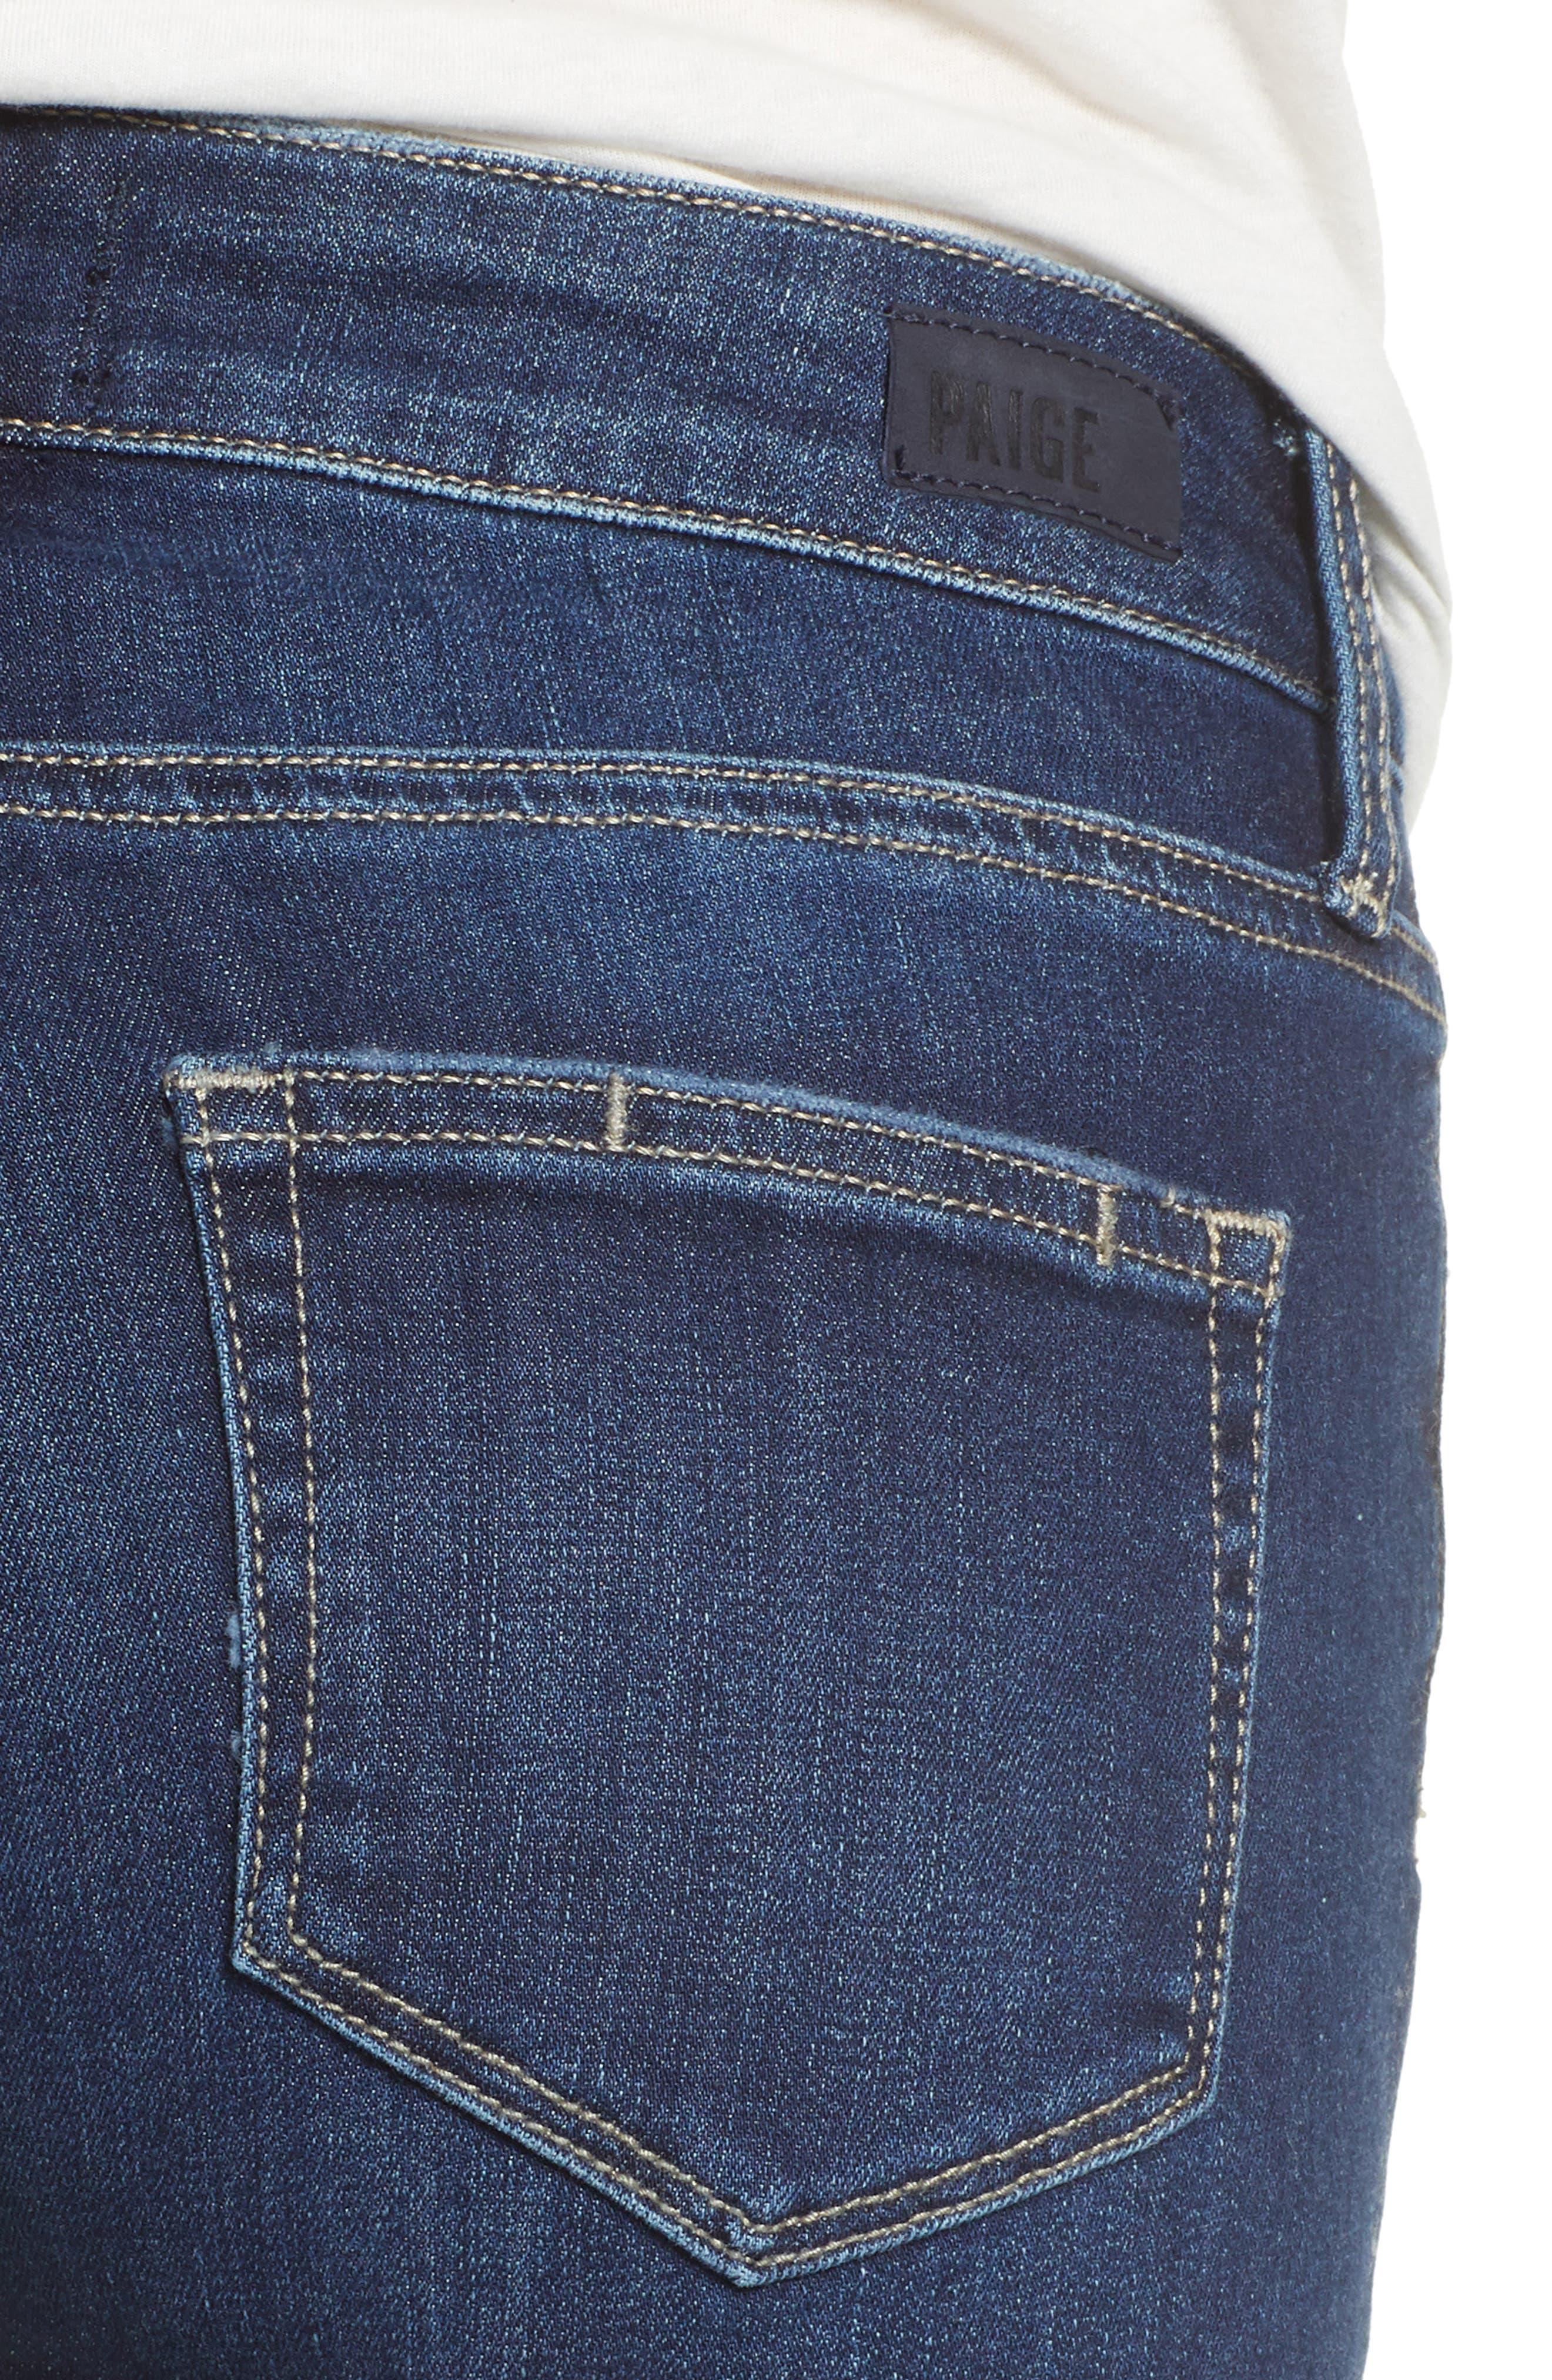 Transcend Vintage - Jax Denim Bermuda Shorts,                             Alternate thumbnail 4, color,                             400